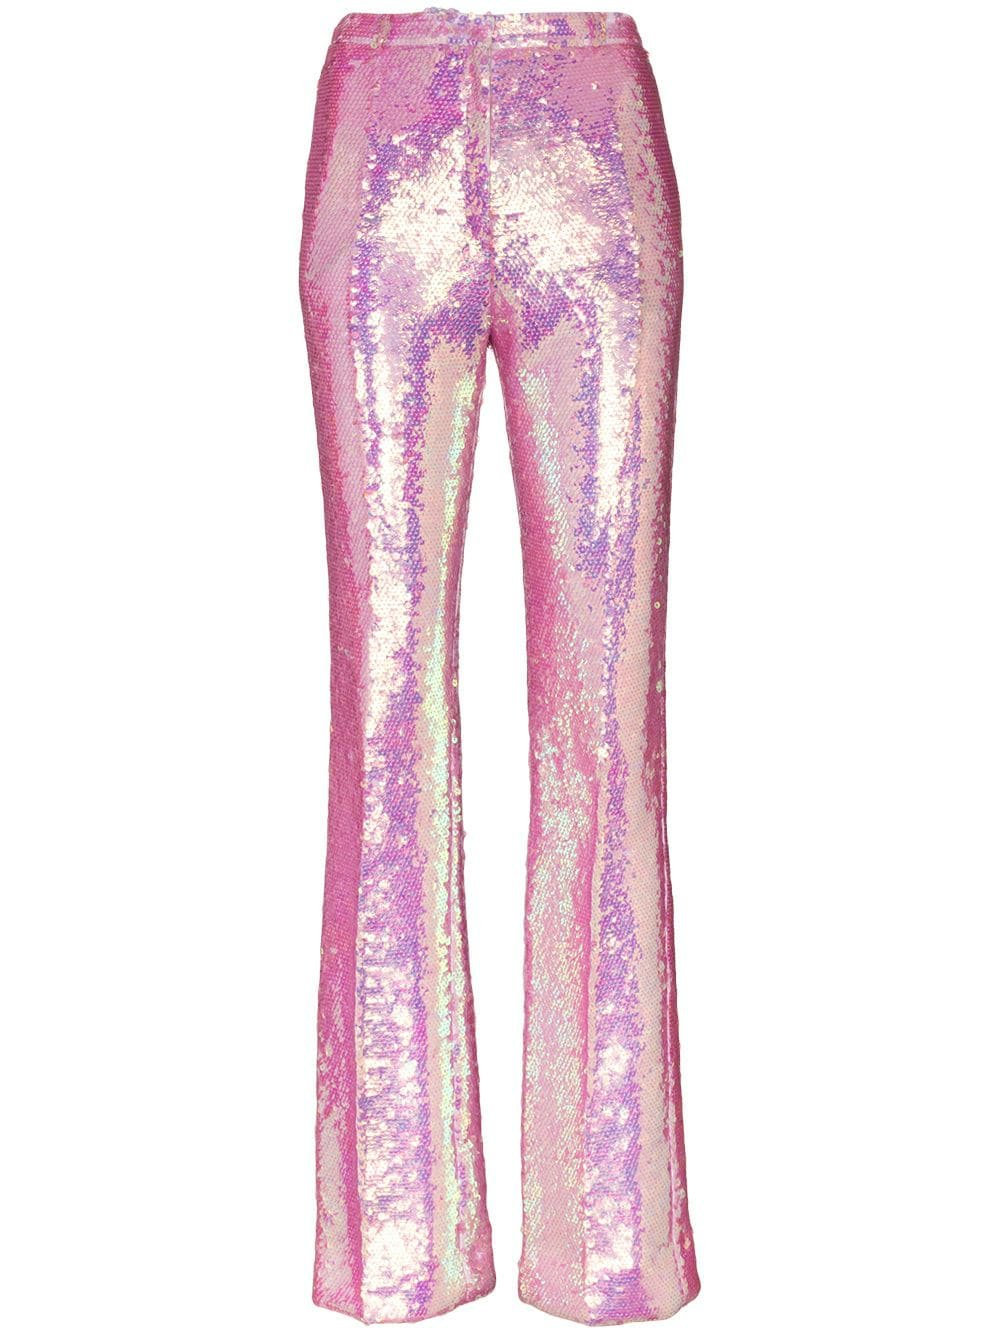 Paco Rabanne high-waist Sequinned Trousers - Farfetch